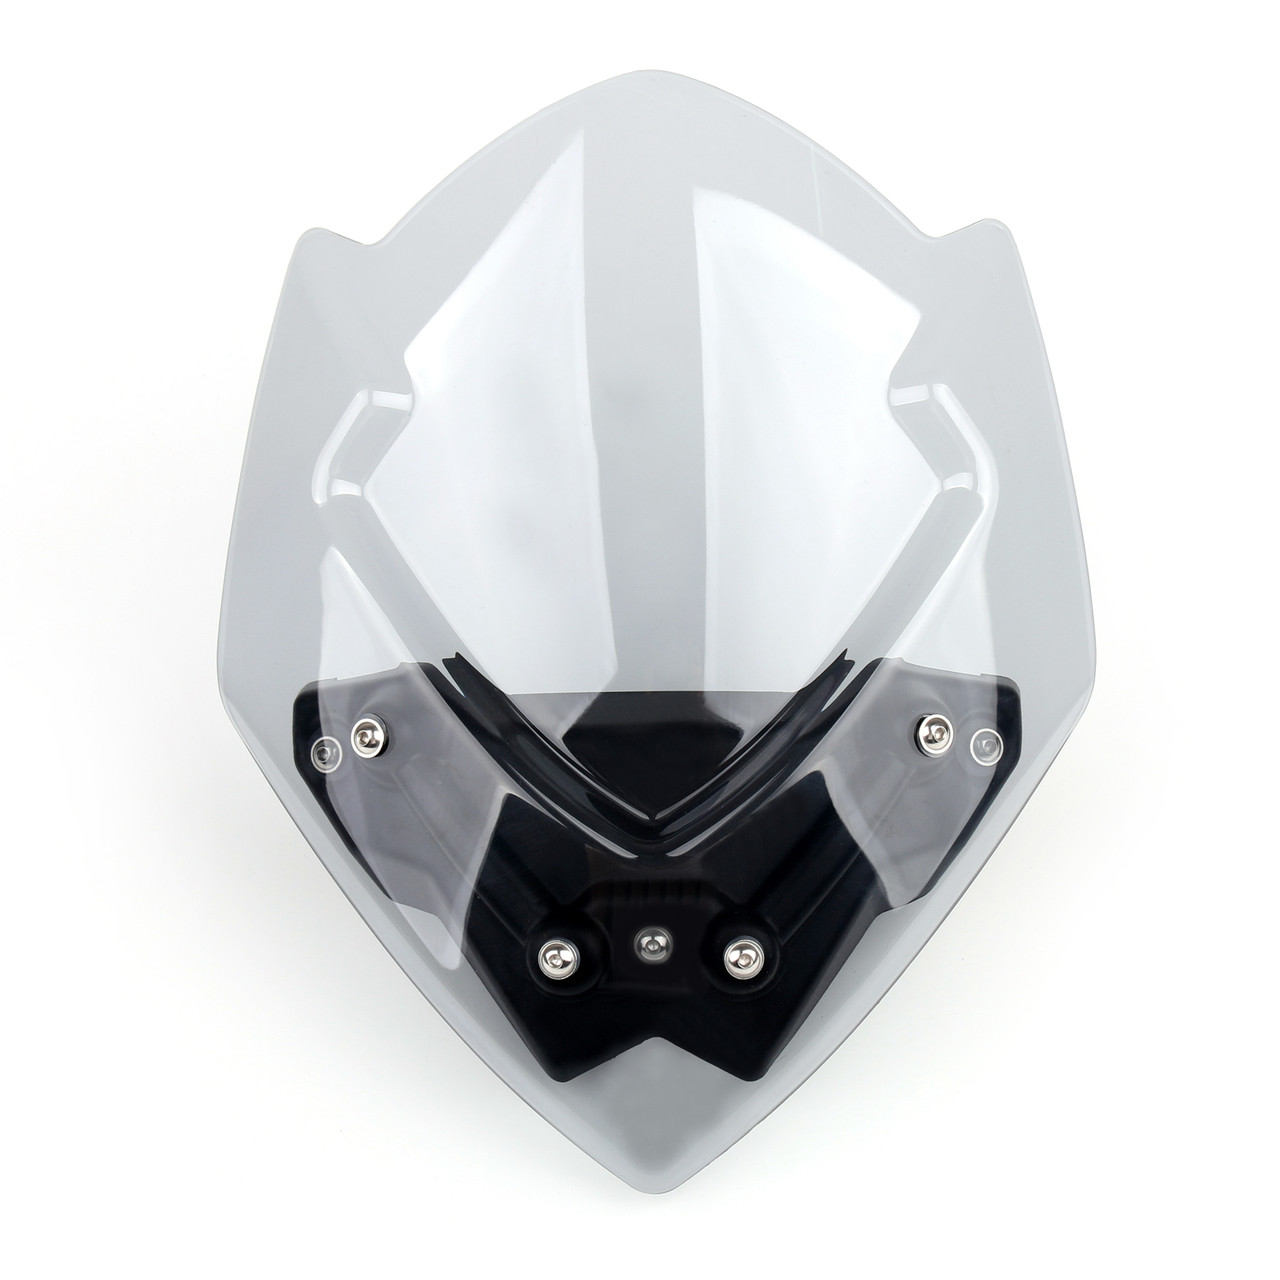 http://www.madhornets.store/AMZ/MotoPart/Windshield/Suzuki/WIN-S317/WIN-S317-Smoke-1.jpg